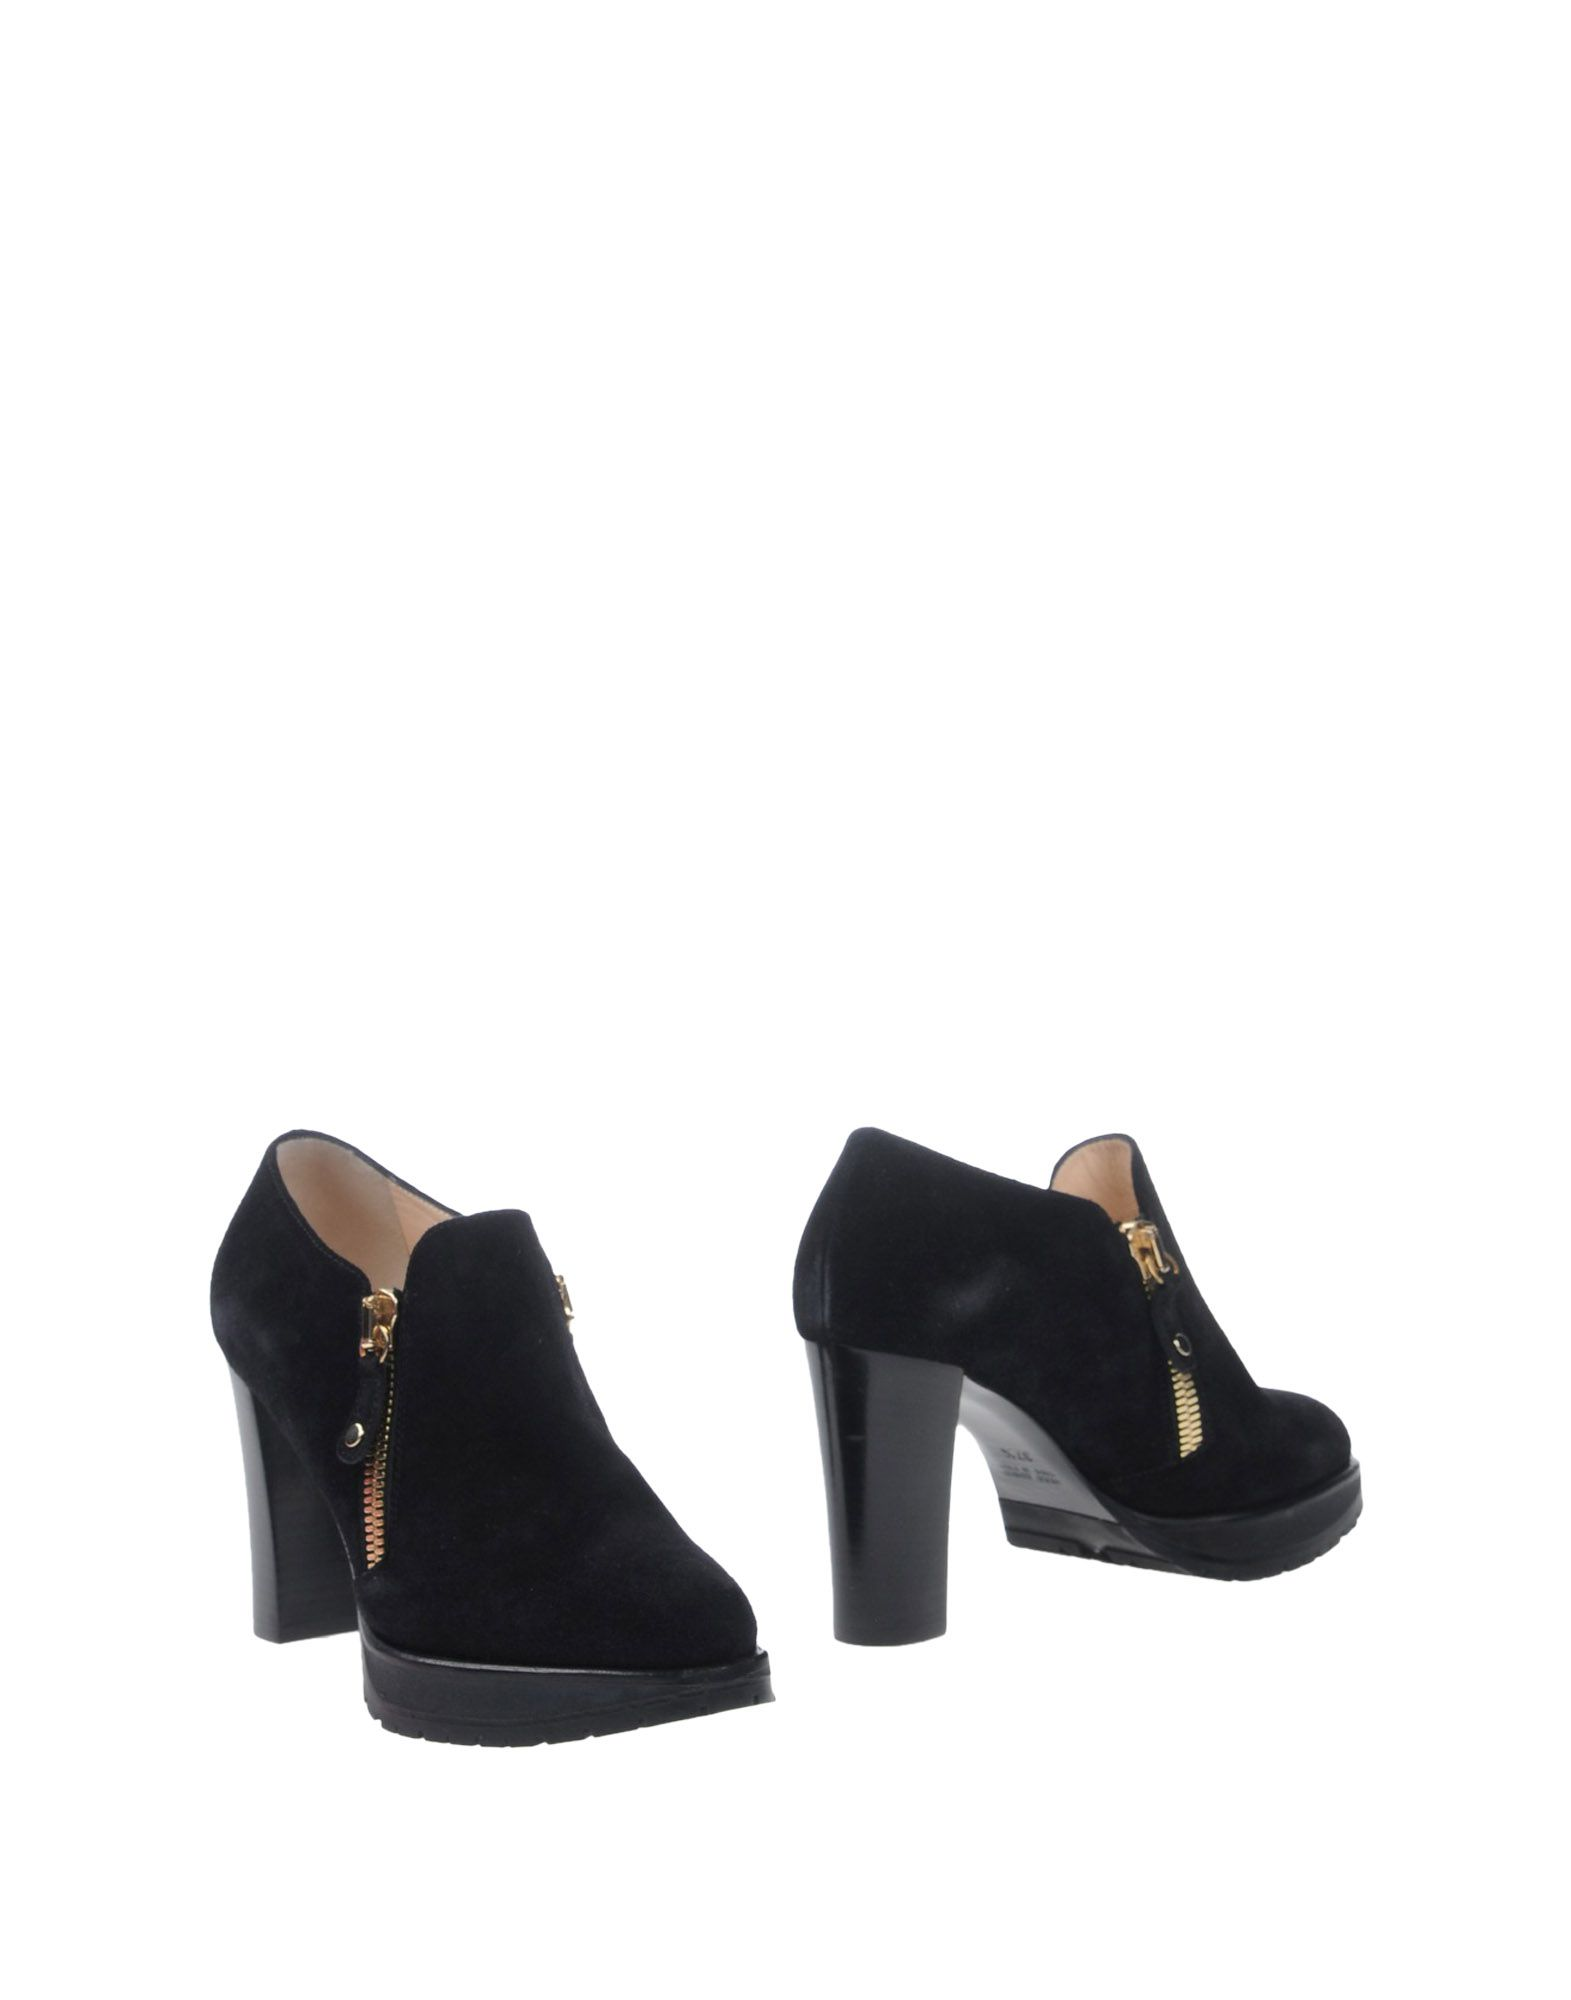 Stilvolle billige Schuhe Damen Lella Baldi Stiefelette Damen Schuhe  11267643AV 5abda7